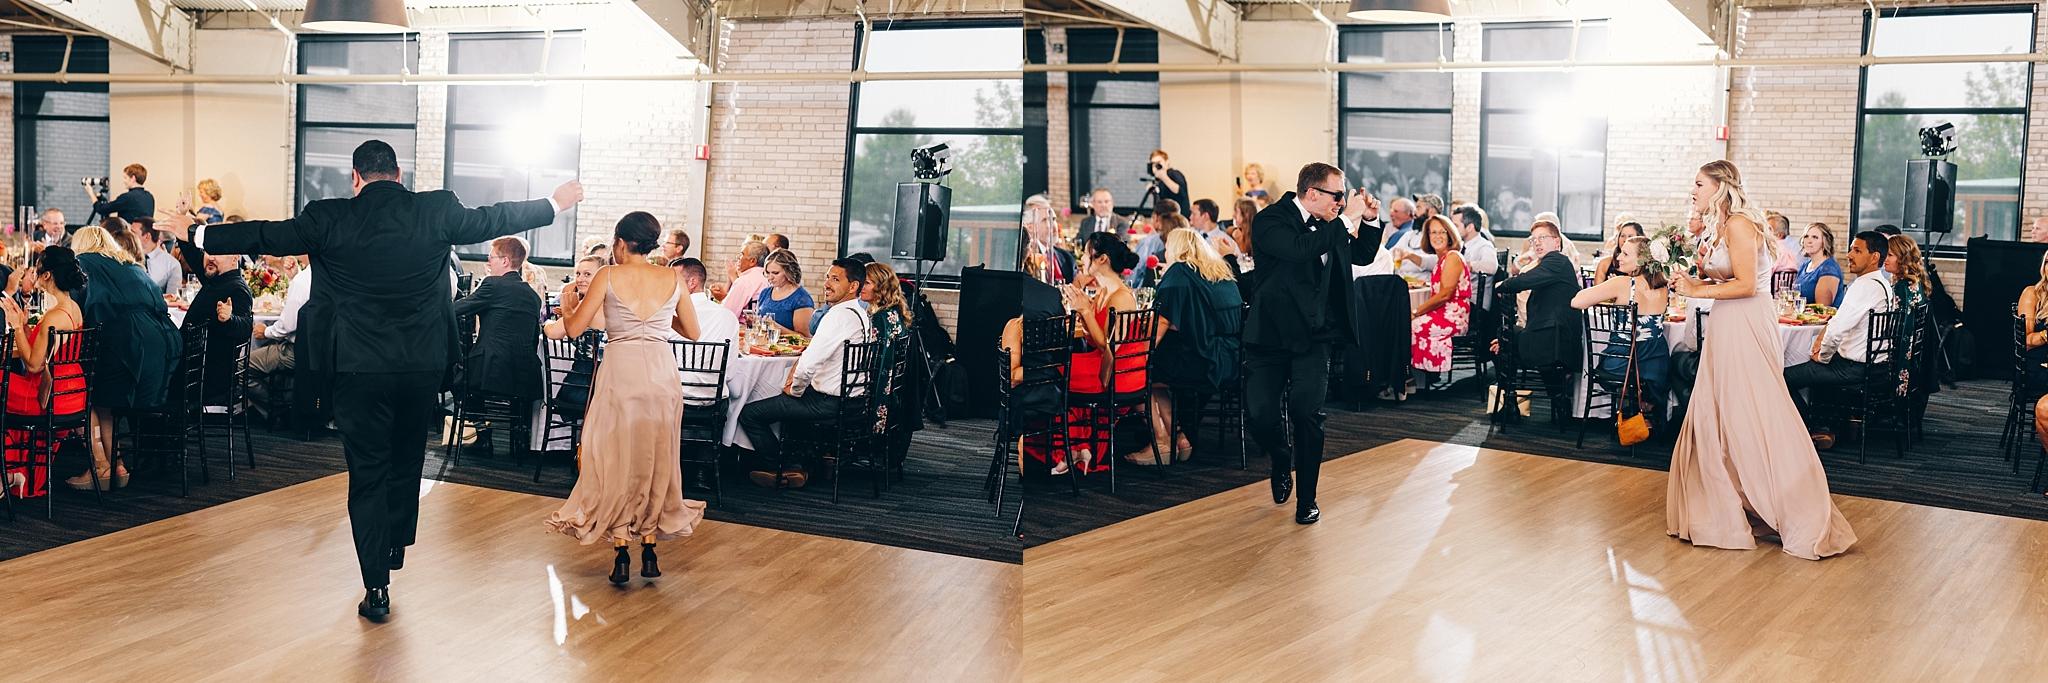 baker-lofts-holland-michigan-wedding-photographer_0386.jpg